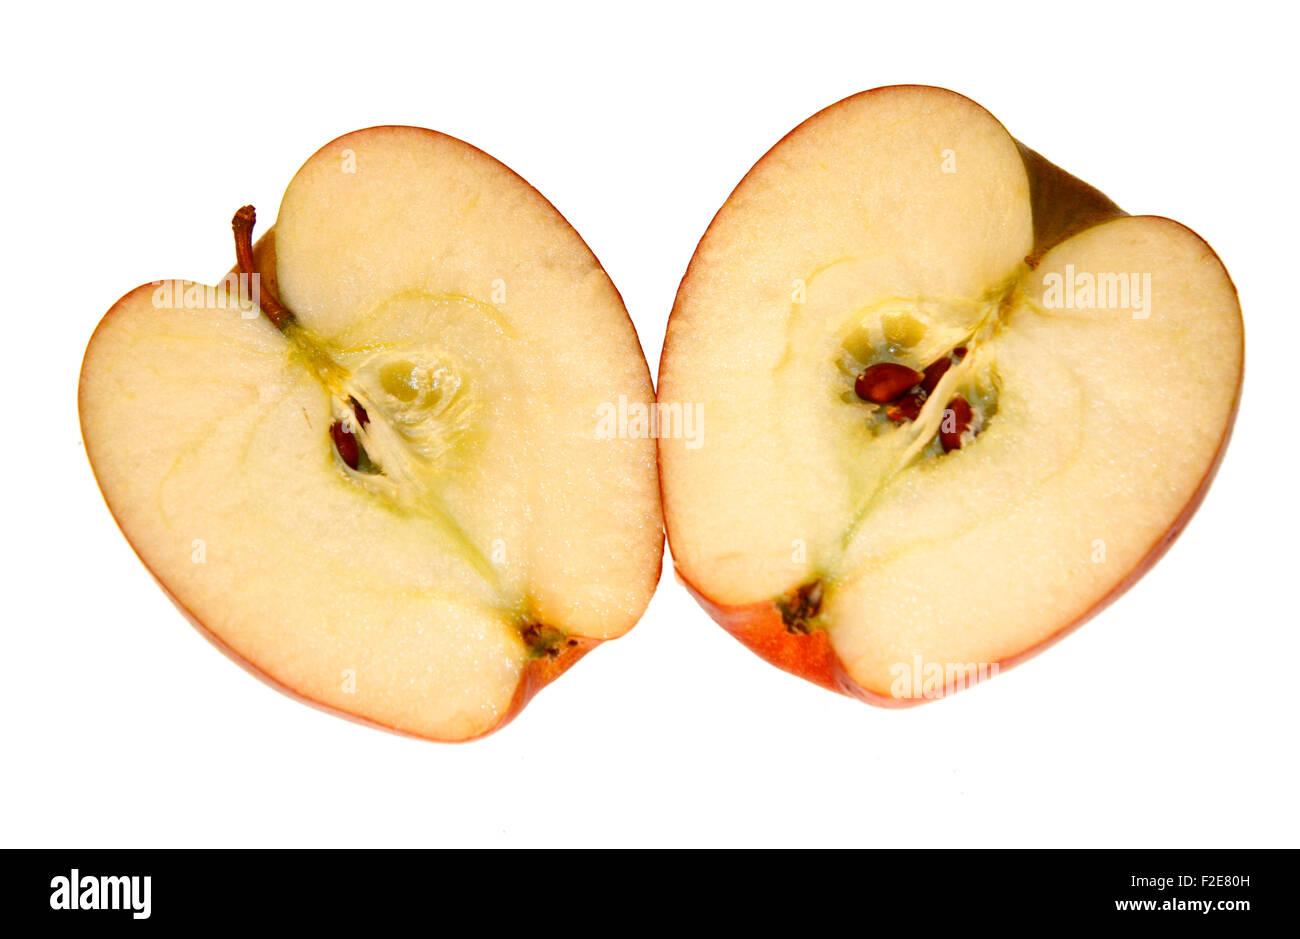 Apfel - Symbolbild Nahrungsmittel. Stock Photo